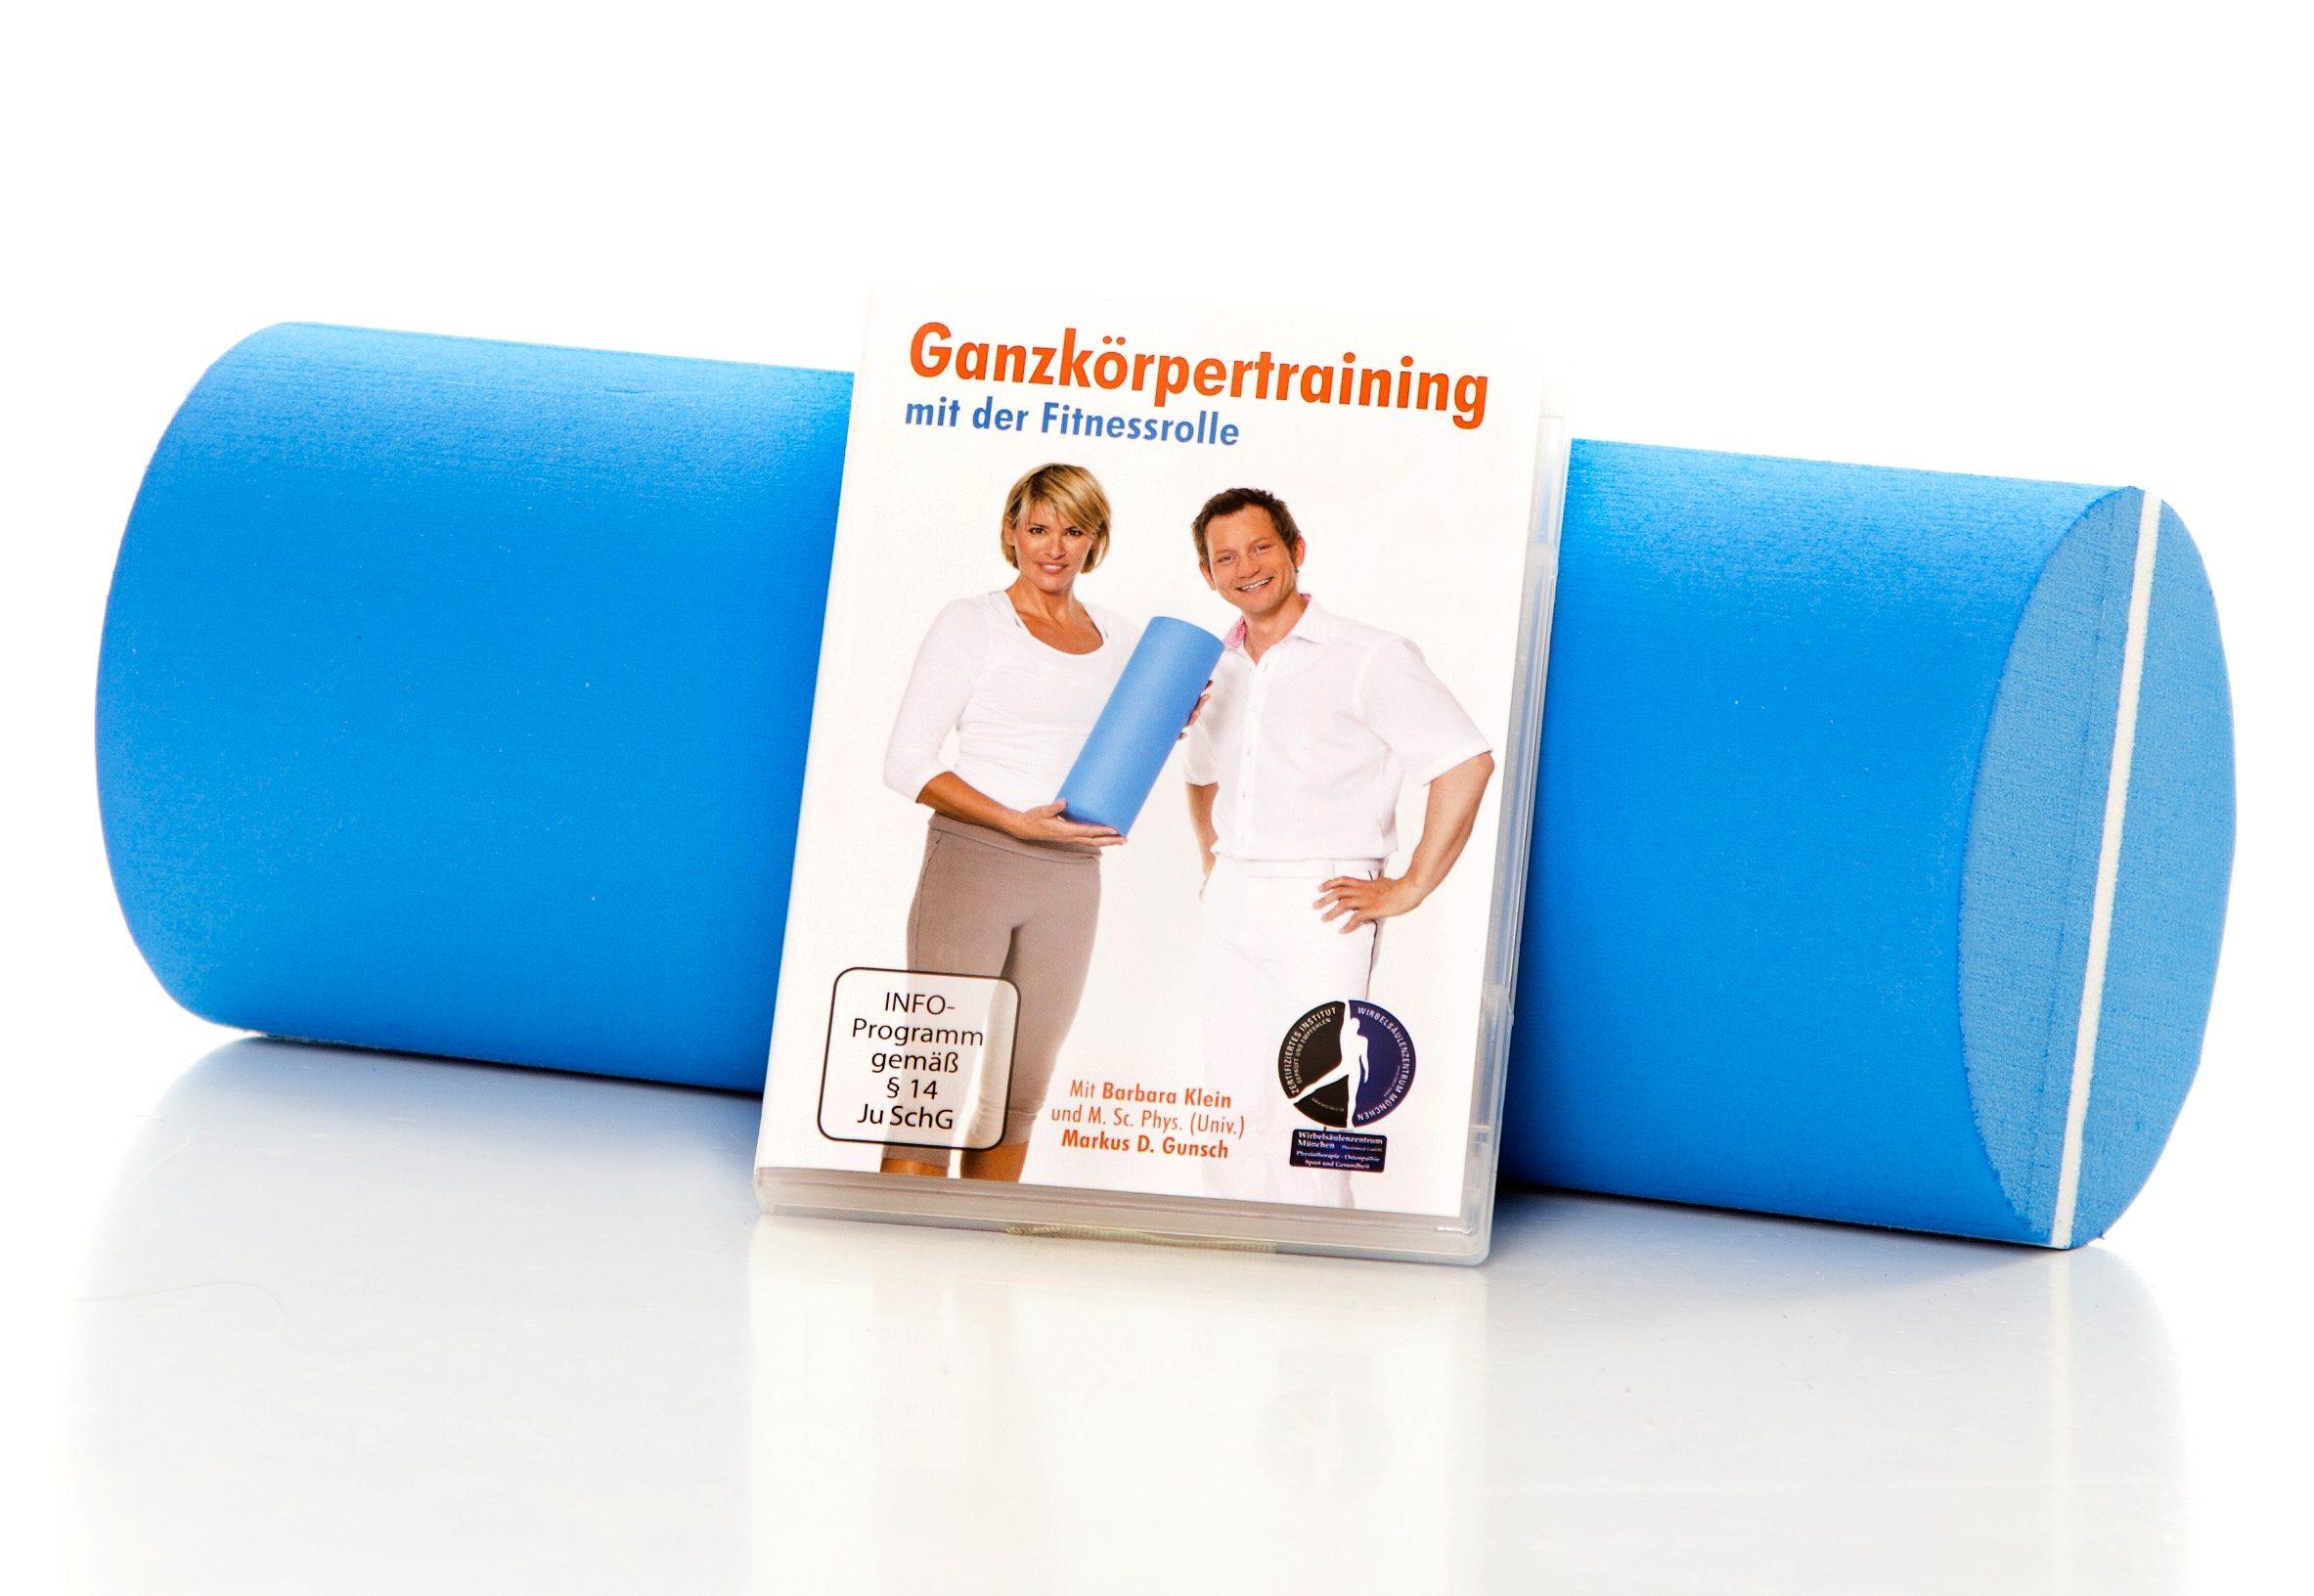 Joka Fit Fitnessrolle inkl. Ganzkörper-Trainings-DVD